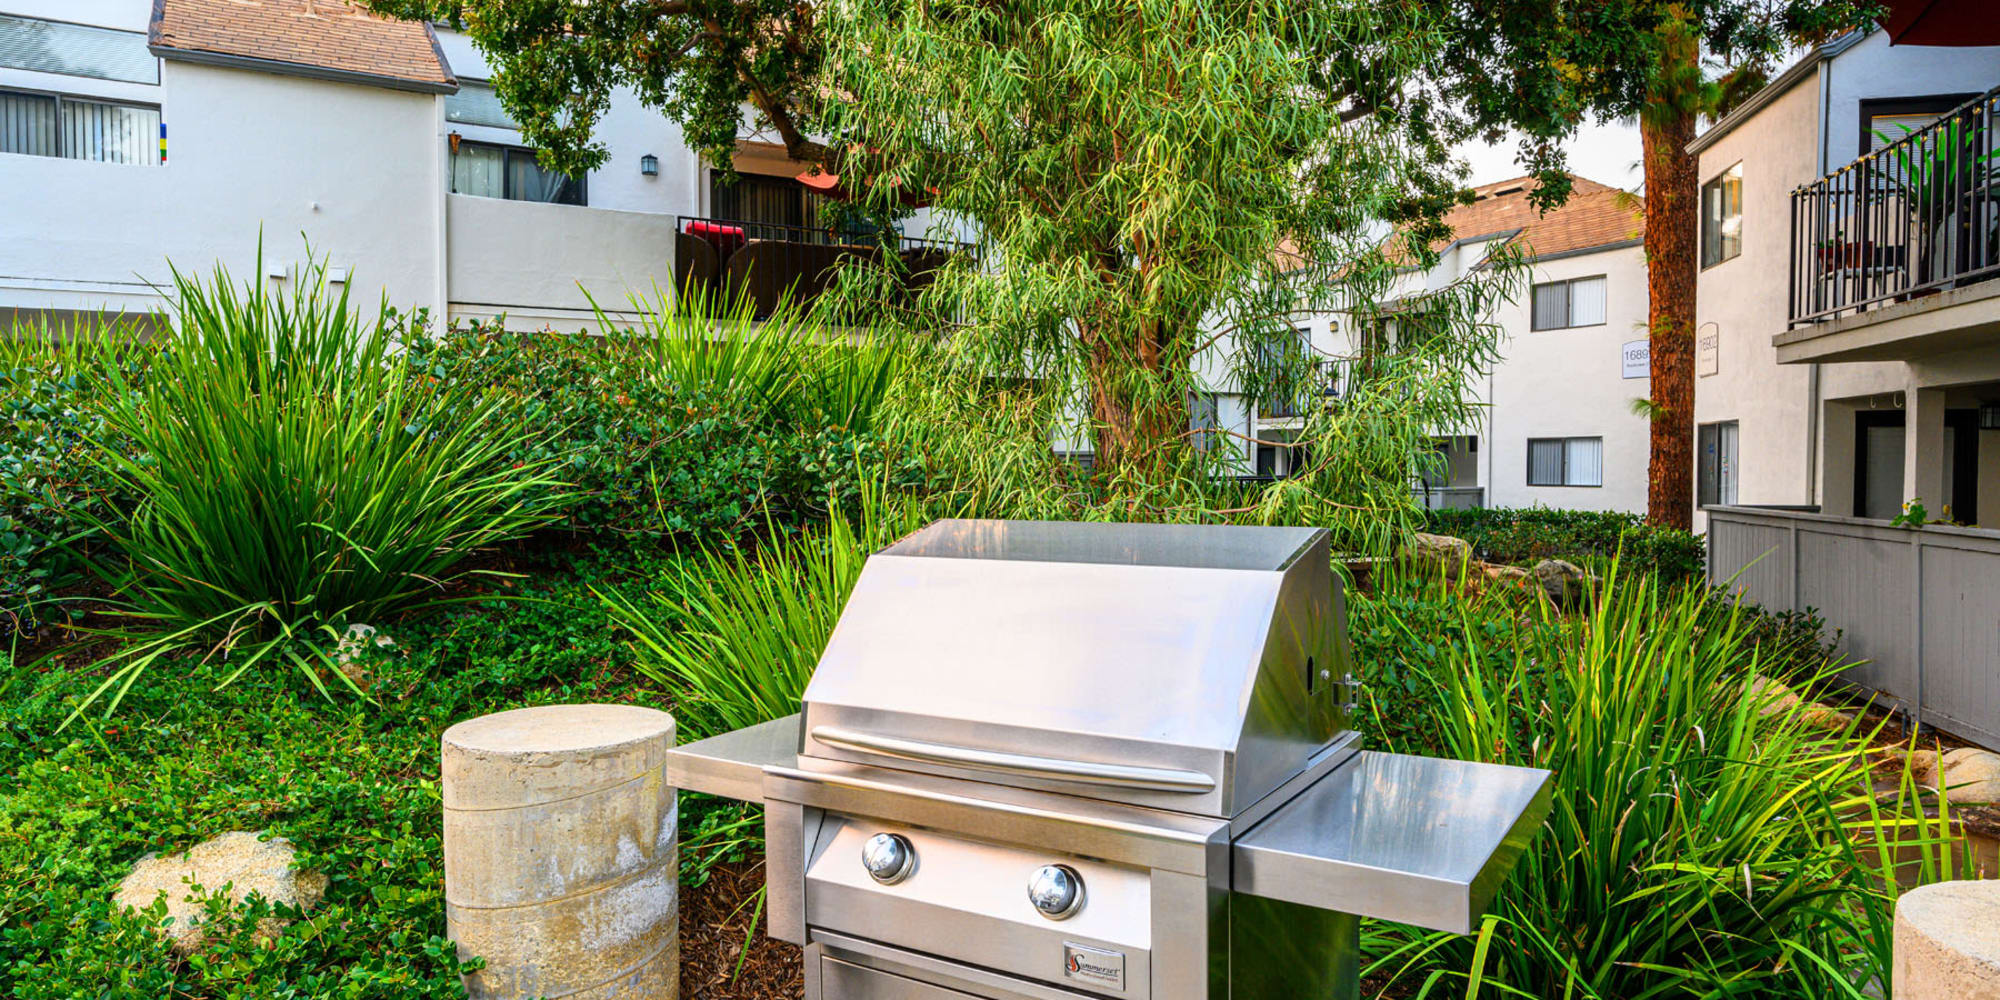 Gas grill at the barbecue area at Sendero Huntington Beach in Huntington Beach, California